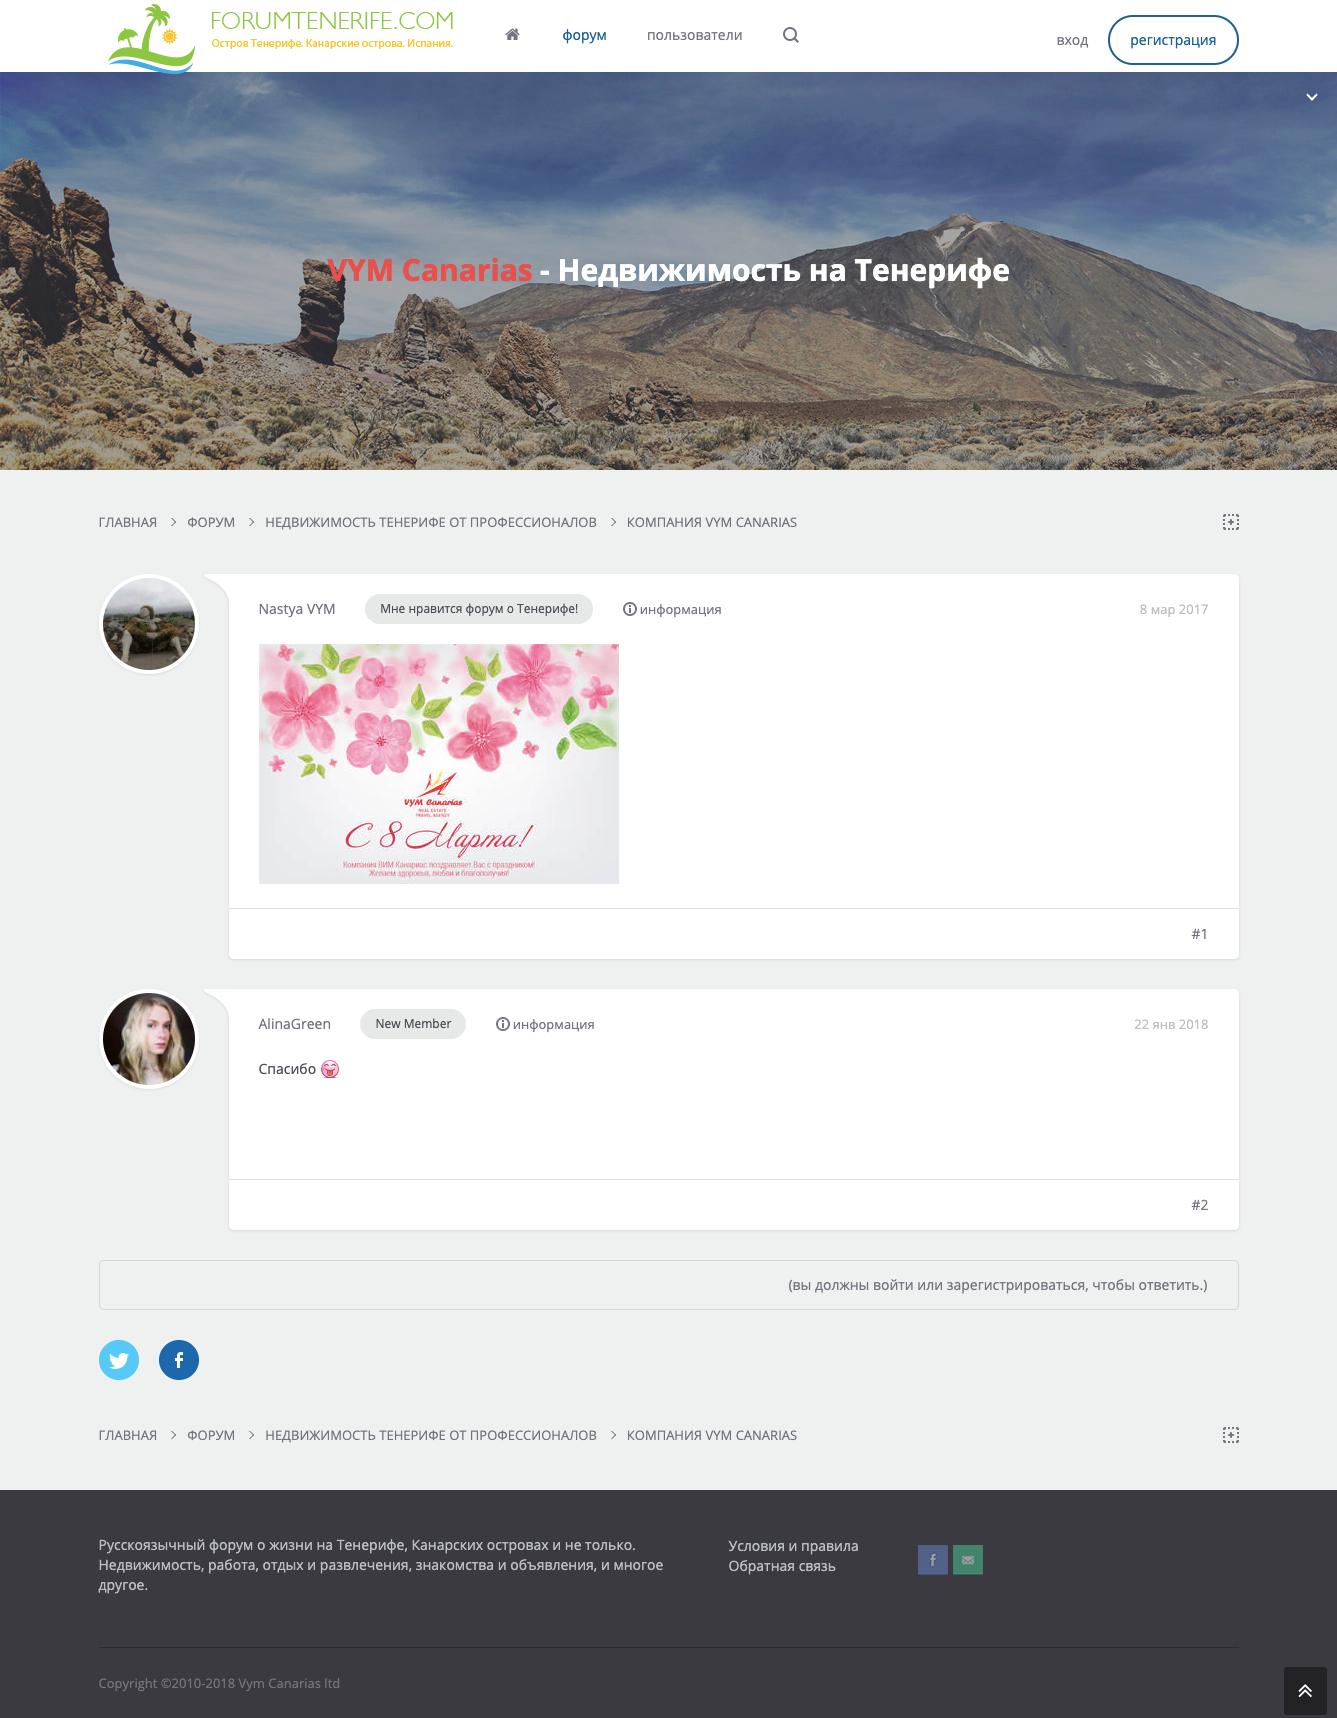 Forumtenerife.com (Форум агентства недвижимости в Испании, XenForo)